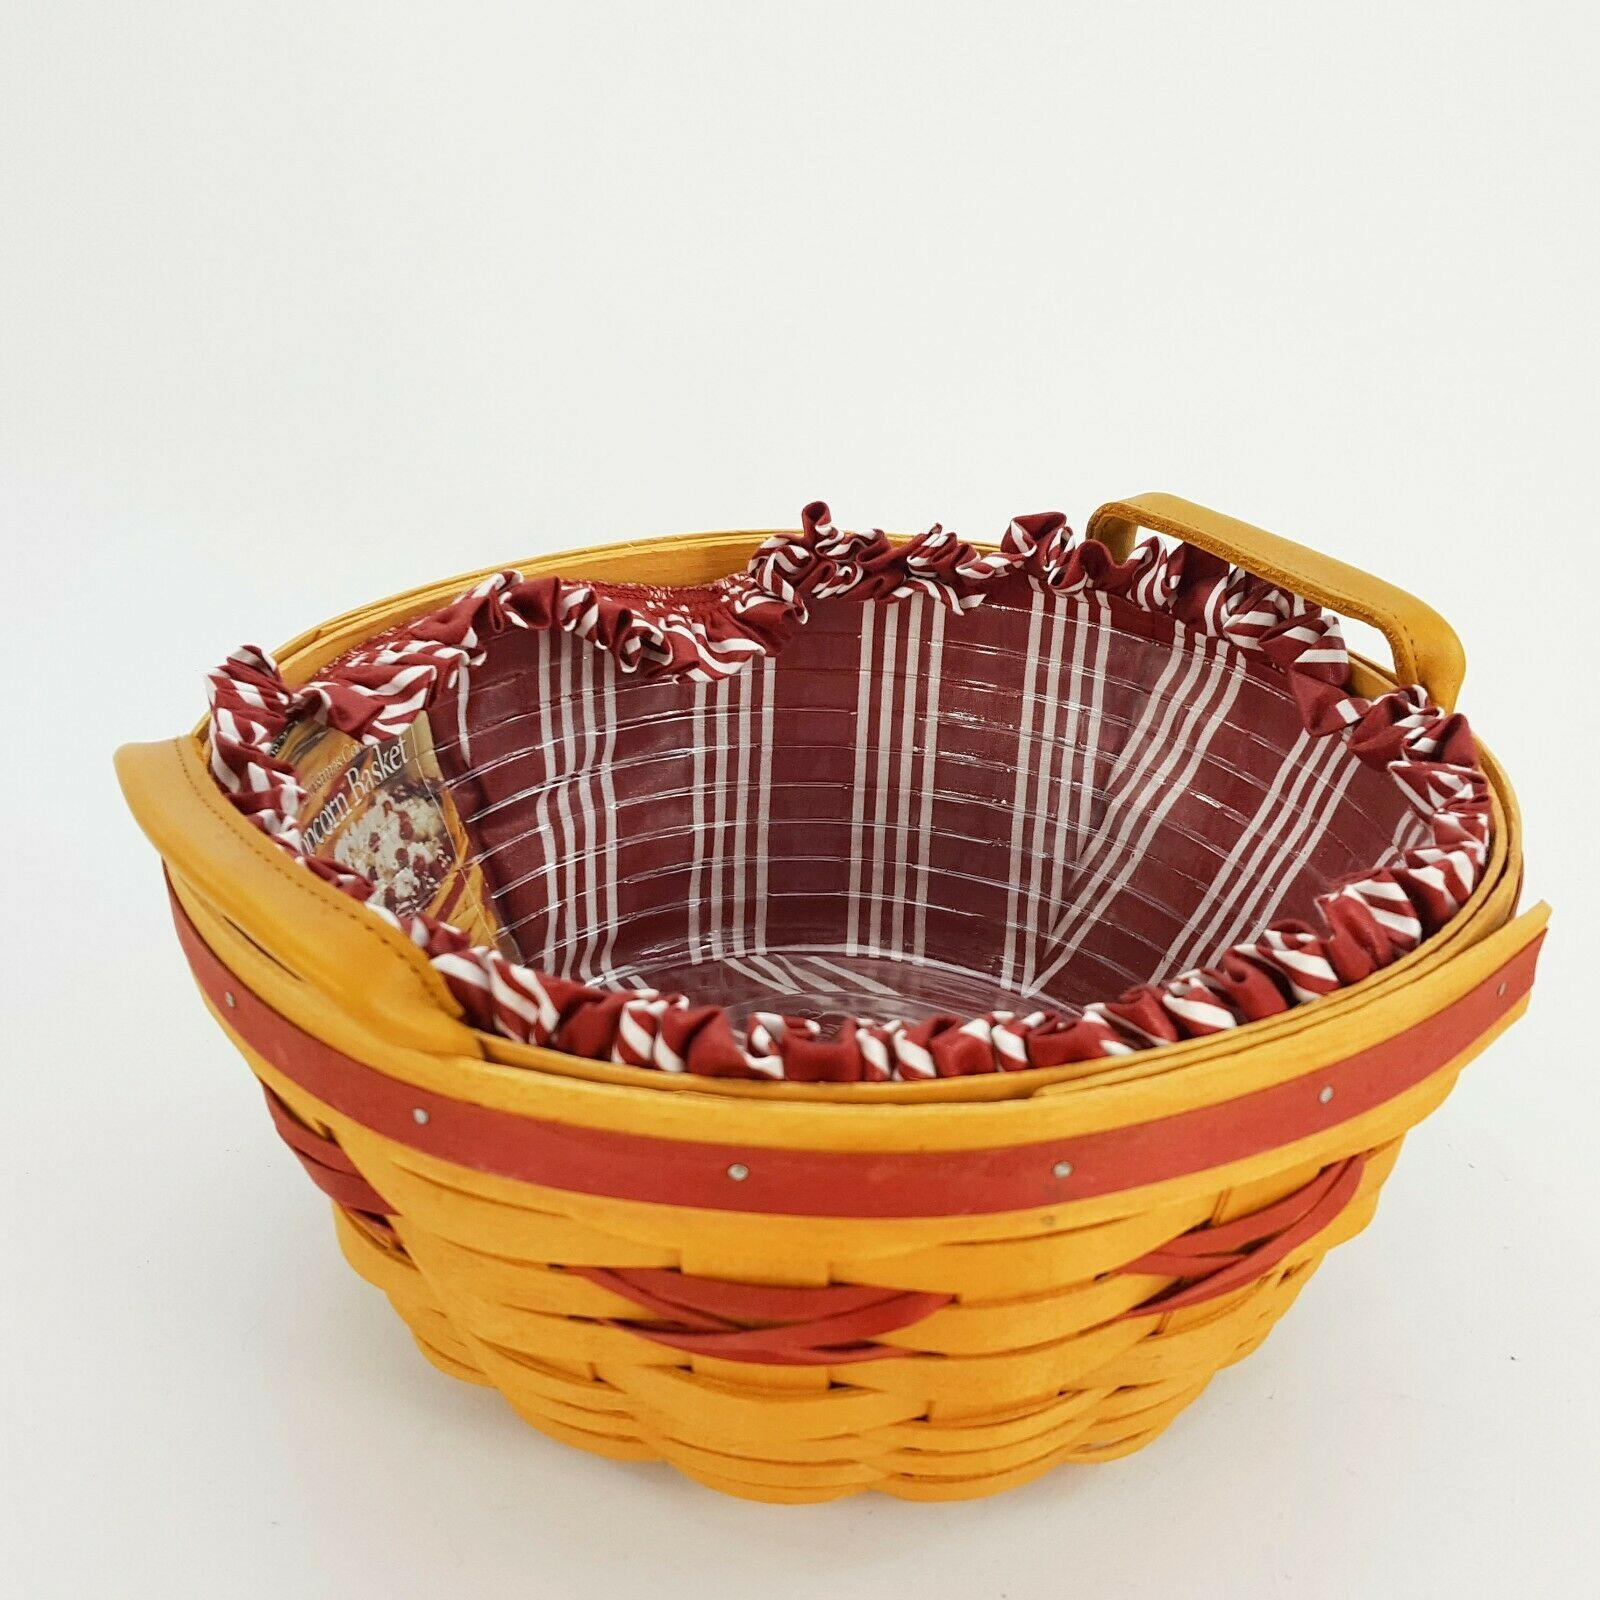 Longaberger 1999 Christmas Popcorn Basket w Protector & Red White Liner 15156 image 6